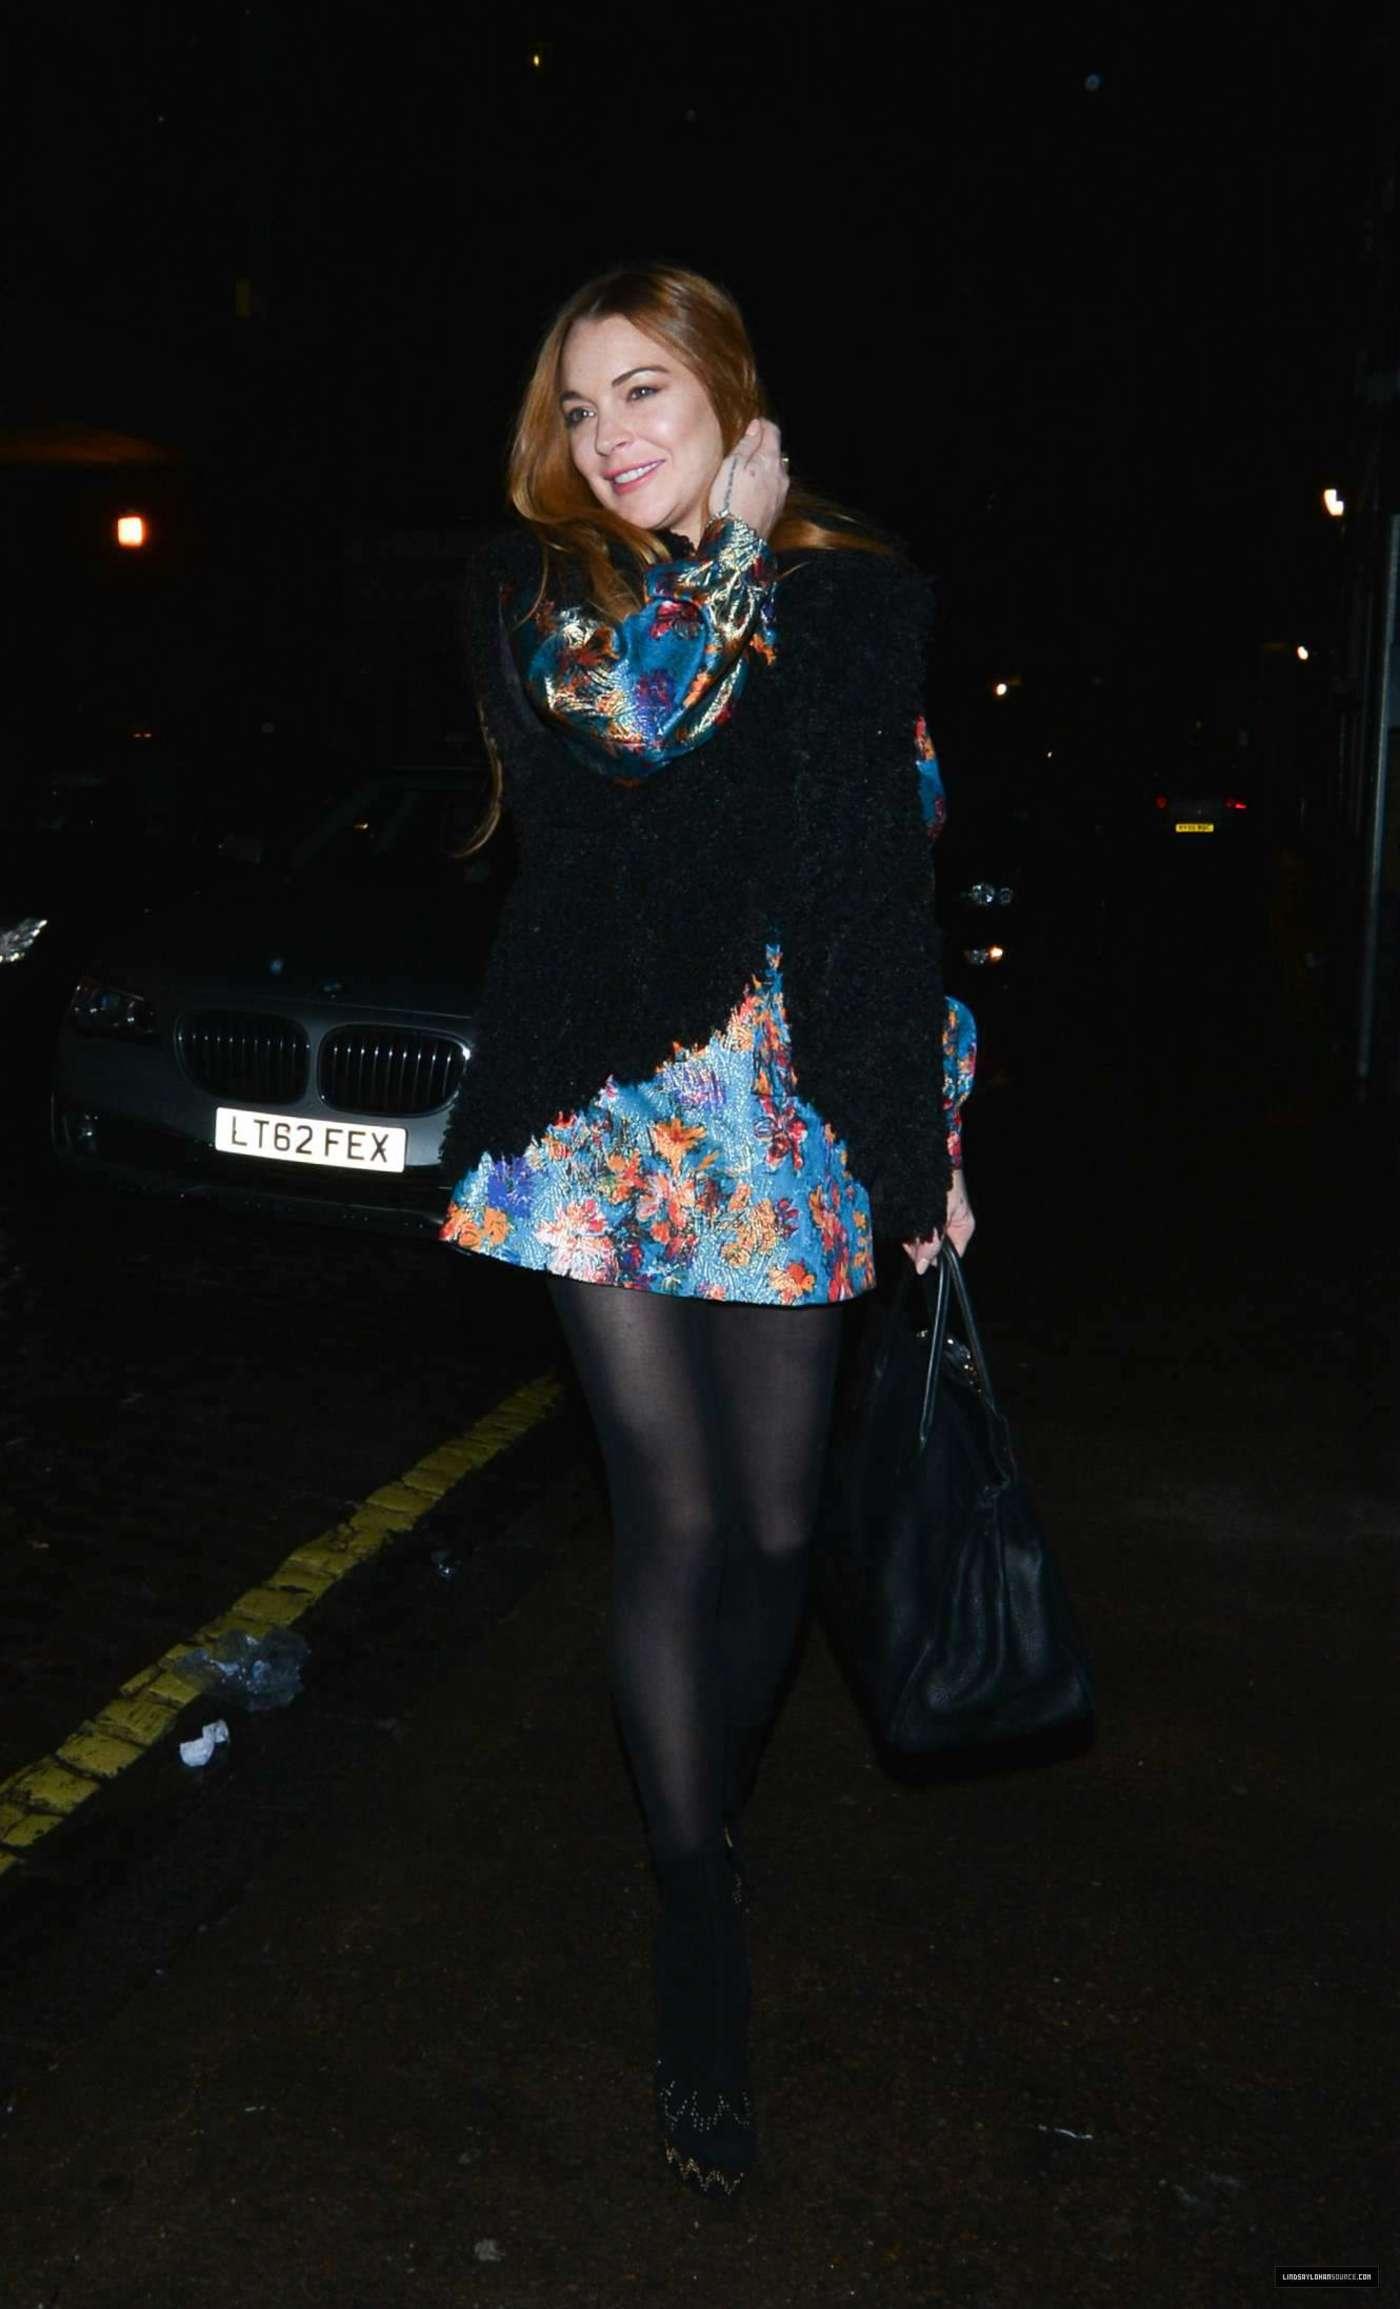 Lindsay Lohan 2014 : Lindsay Lohan in Mini Dress Leaves the Chiltern Firehouse -12